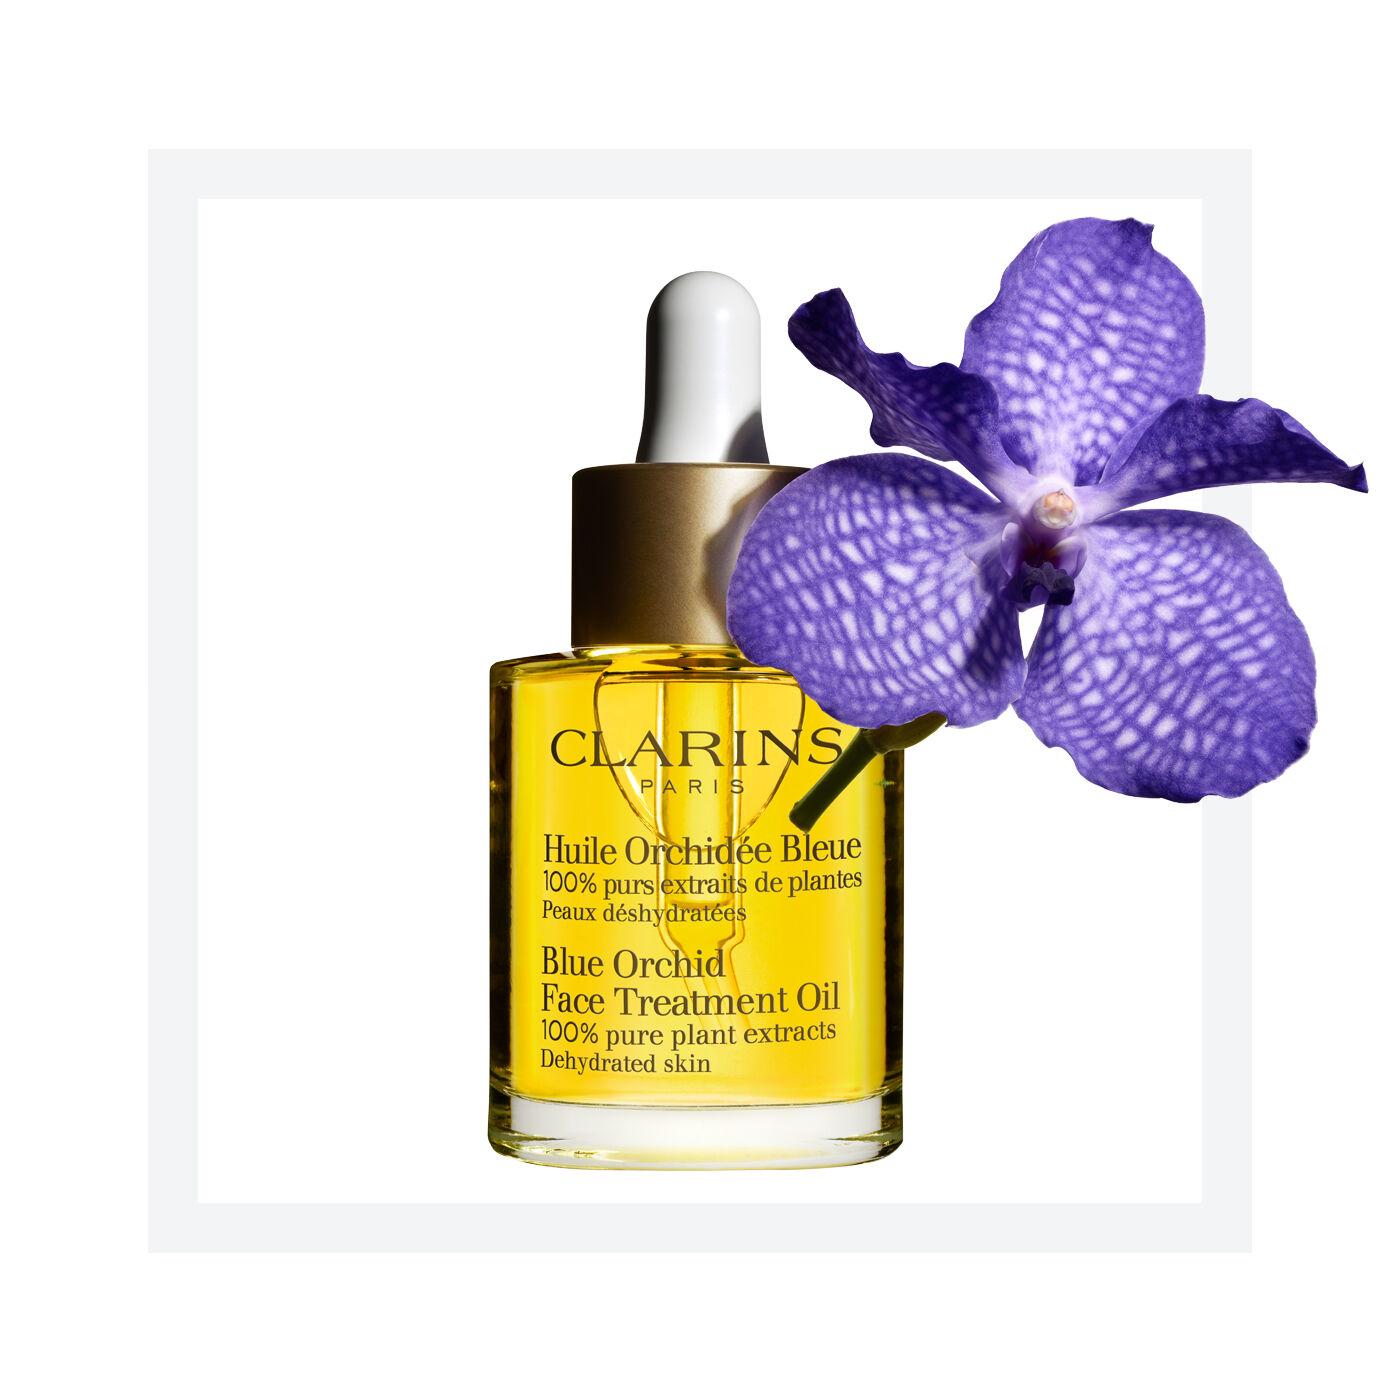 Blue Orchid Face Treatment Oil